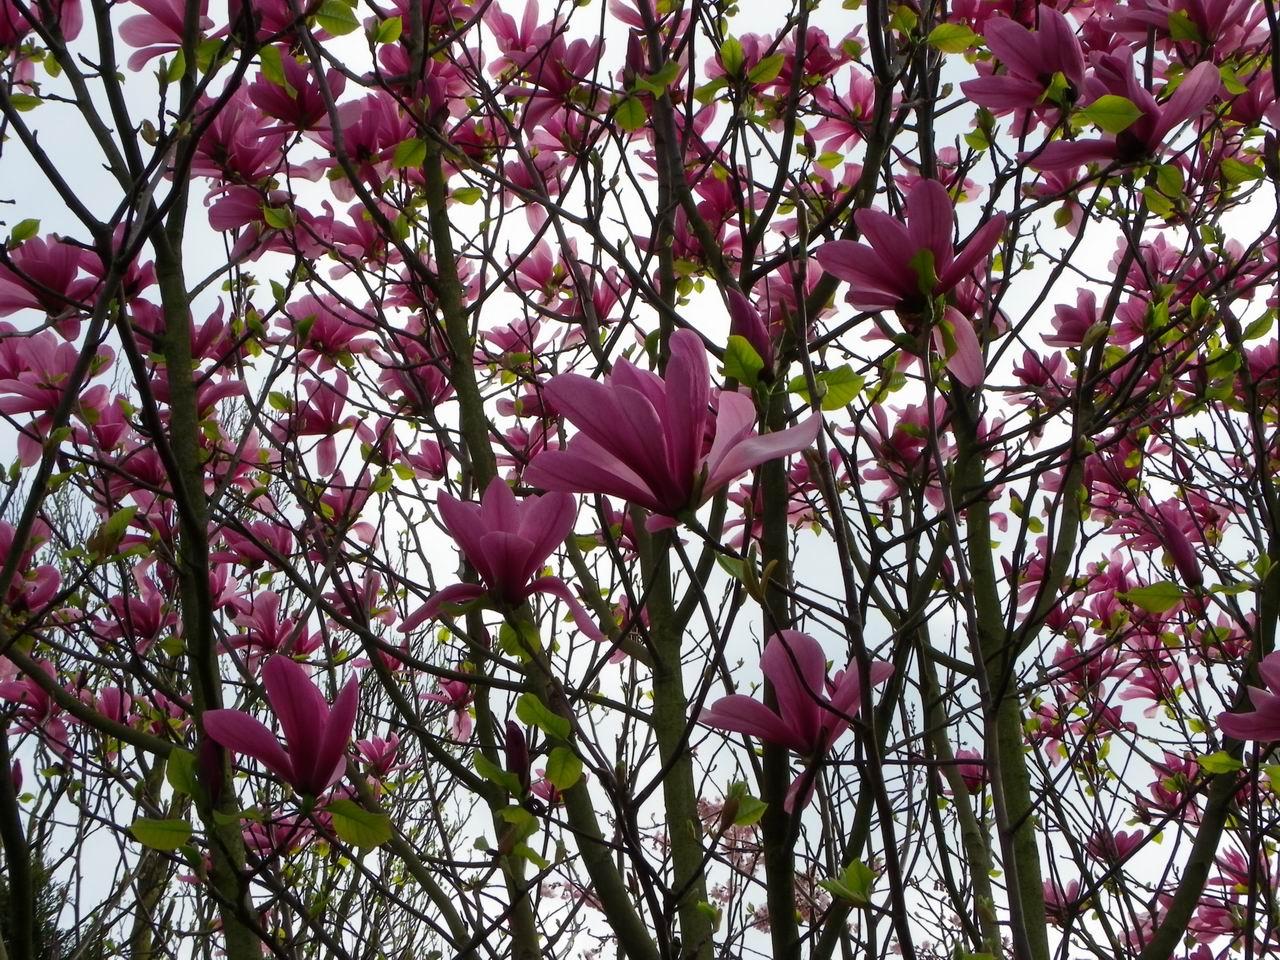 evariste zephyrin photographer arbre en fleurs le magnolia. Black Bedroom Furniture Sets. Home Design Ideas